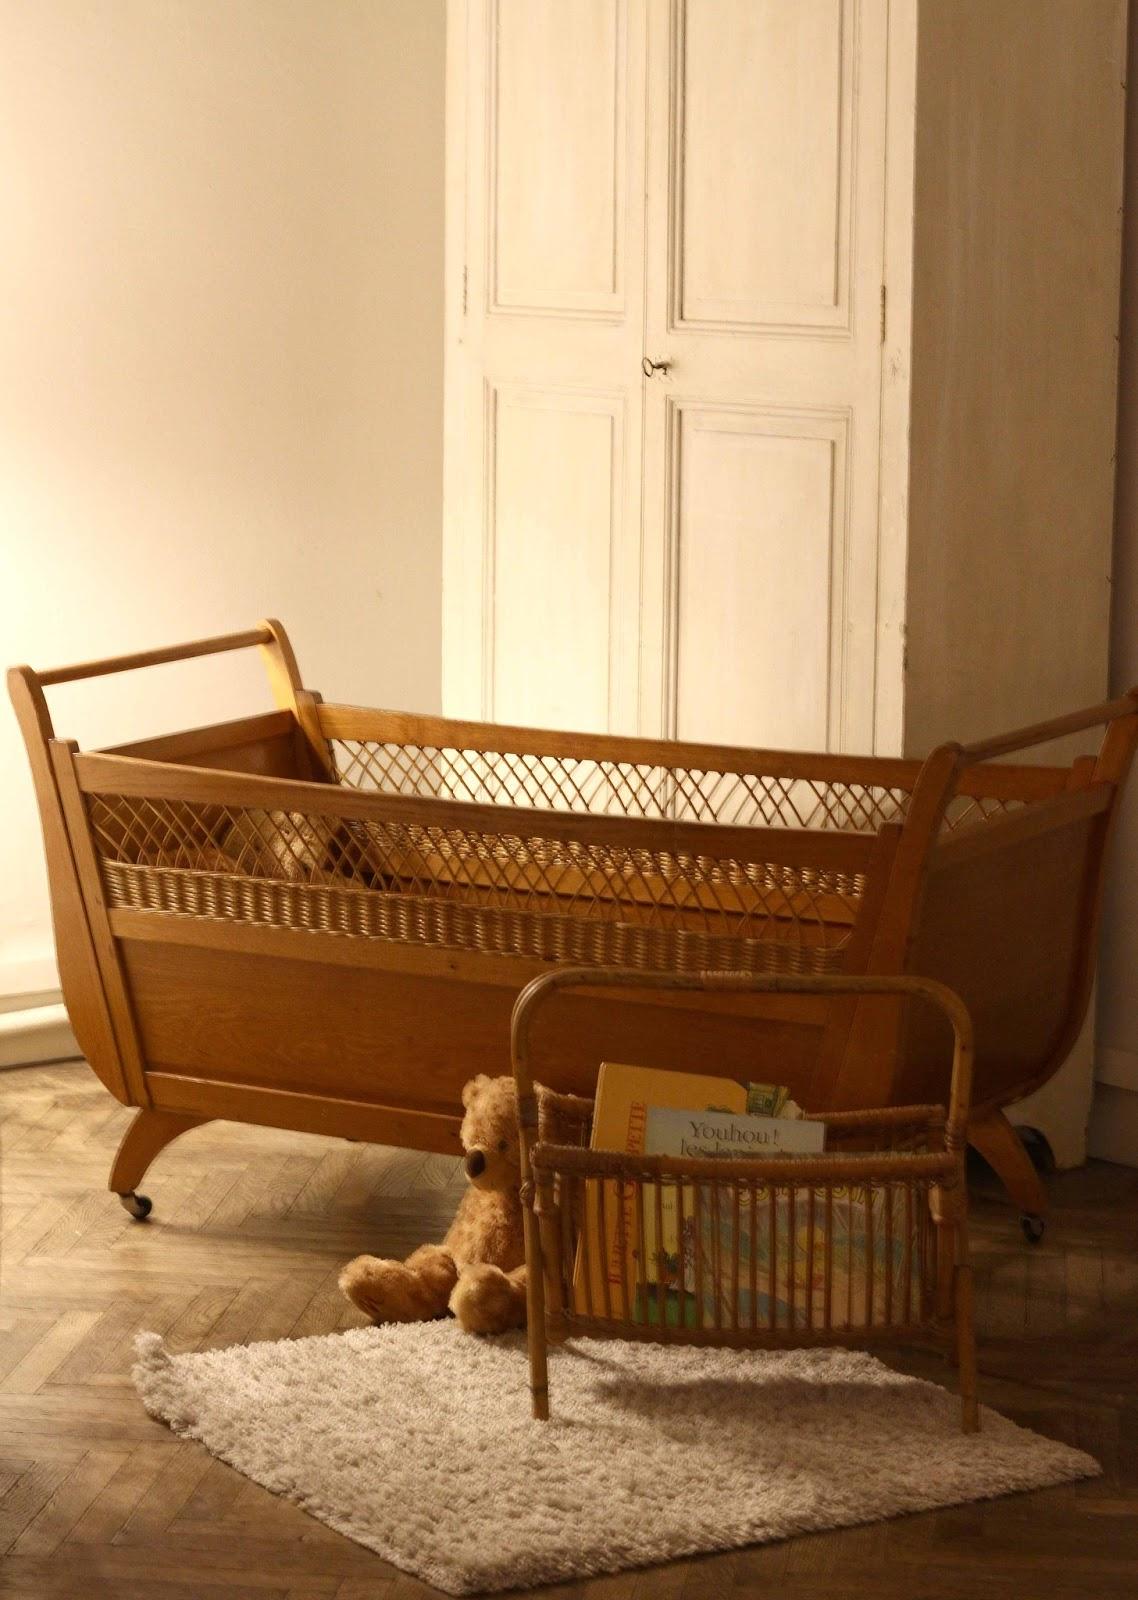 matelas 140x60. Black Bedroom Furniture Sets. Home Design Ideas